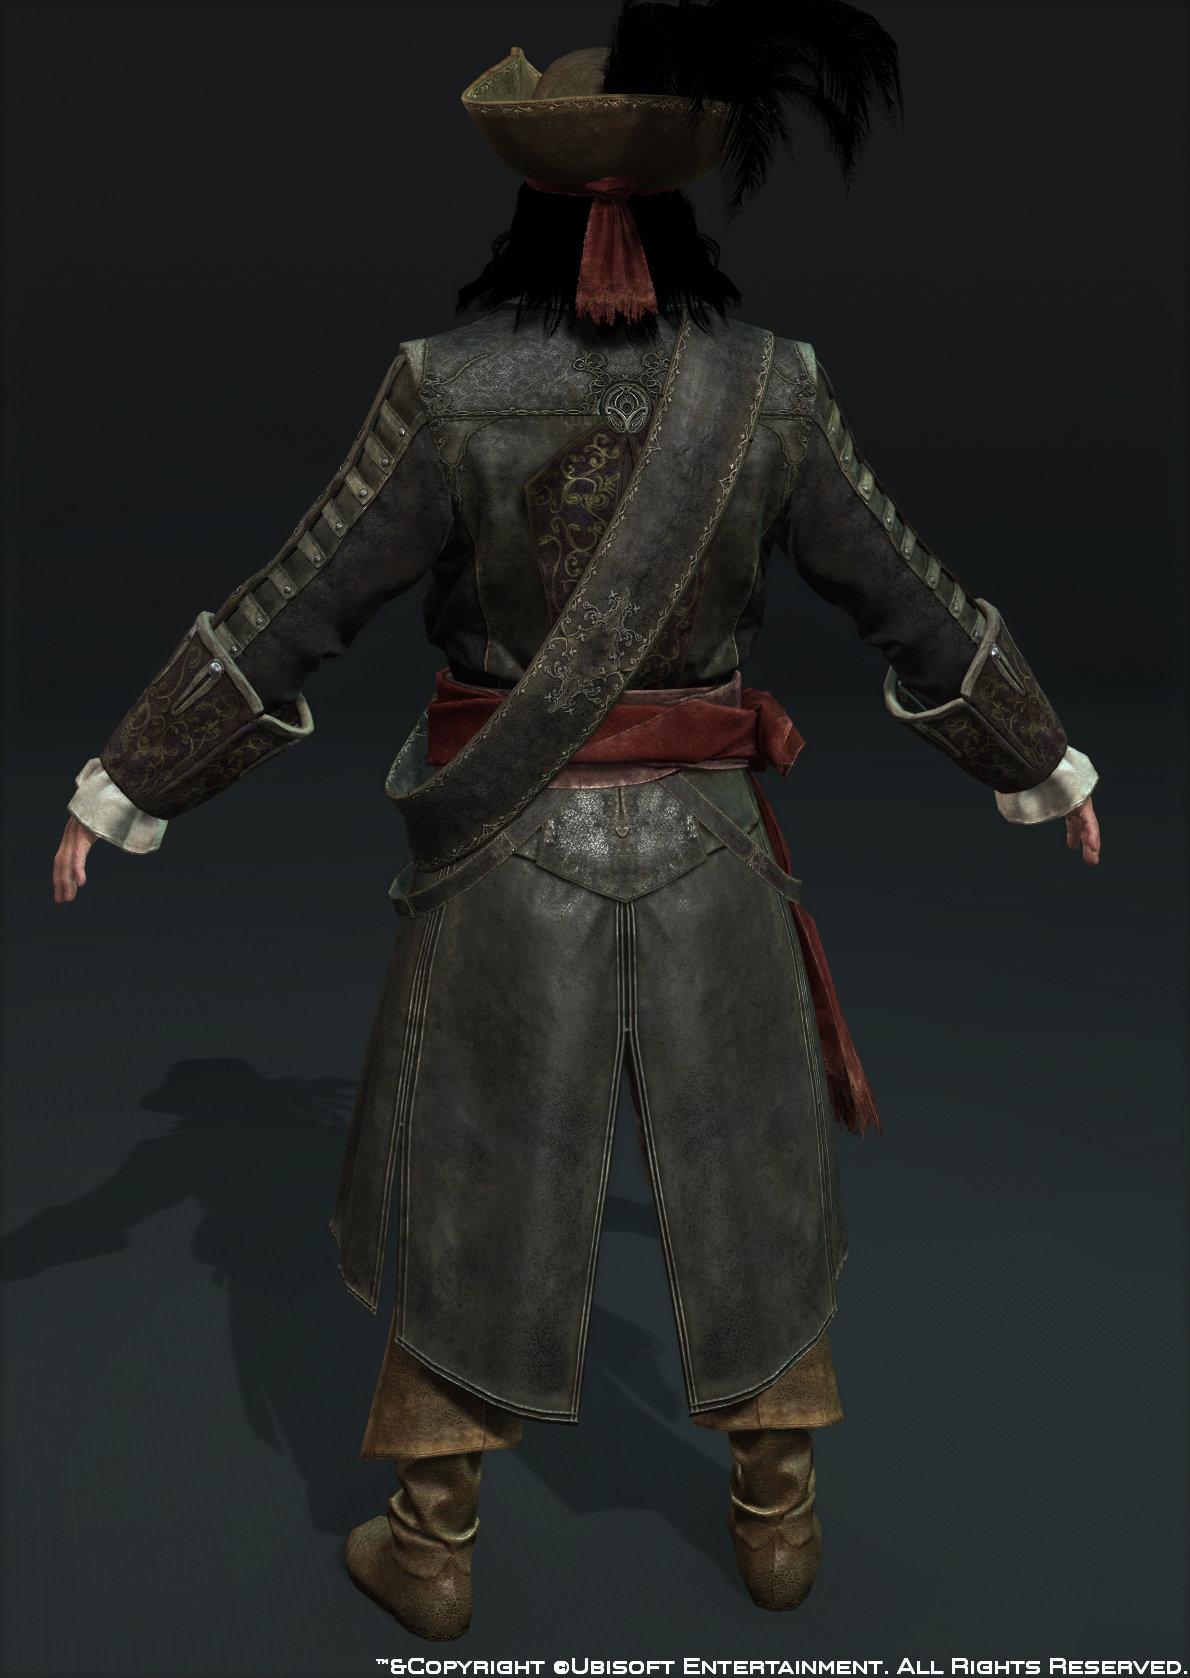 Body blackbeard back